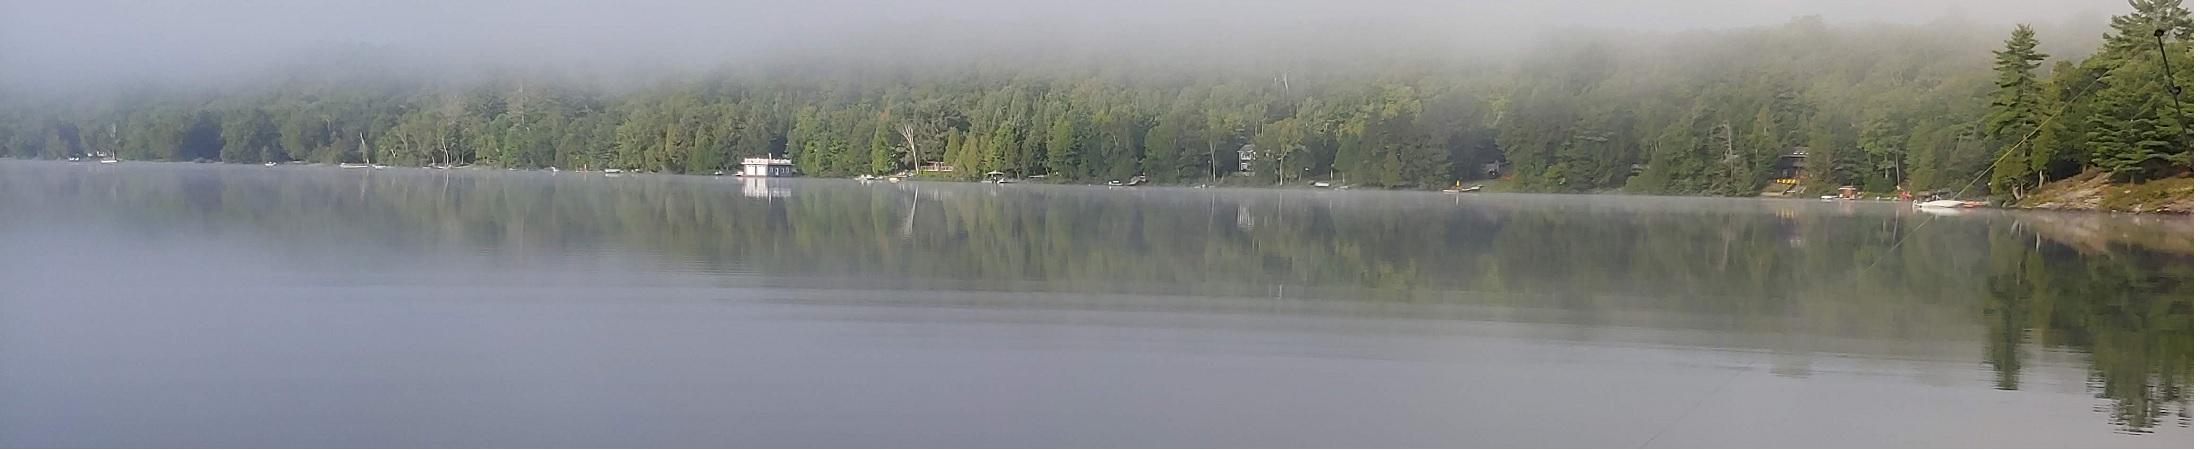 Paint Lake